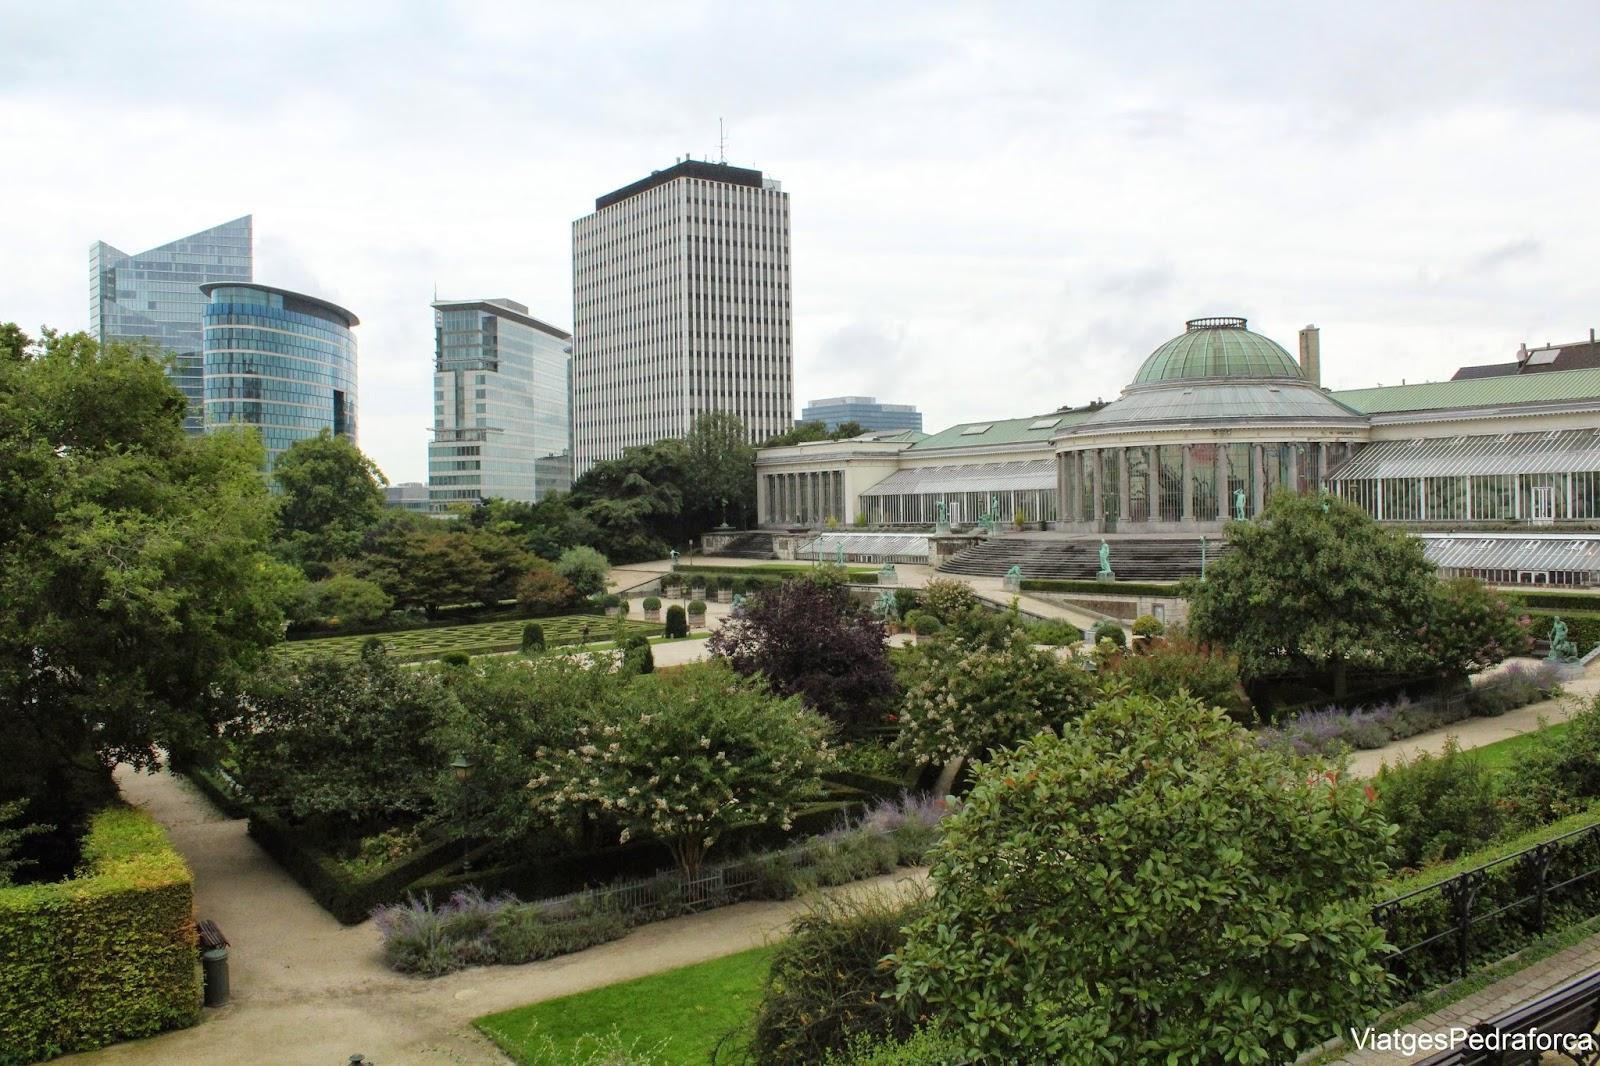 Jardi Botanic Brussel.les Belgica